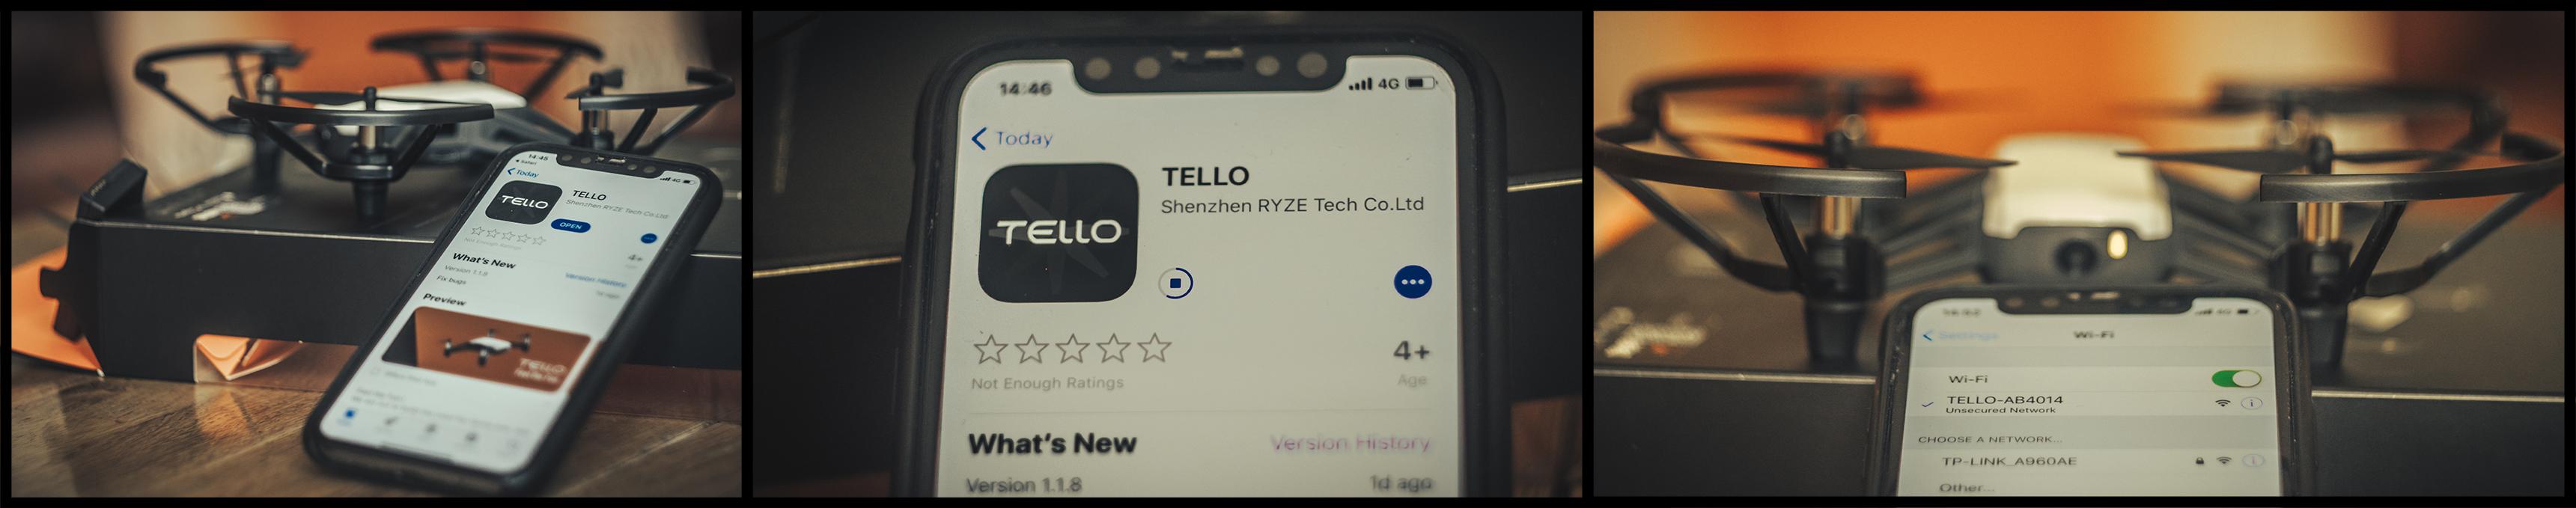 tello5.jpg